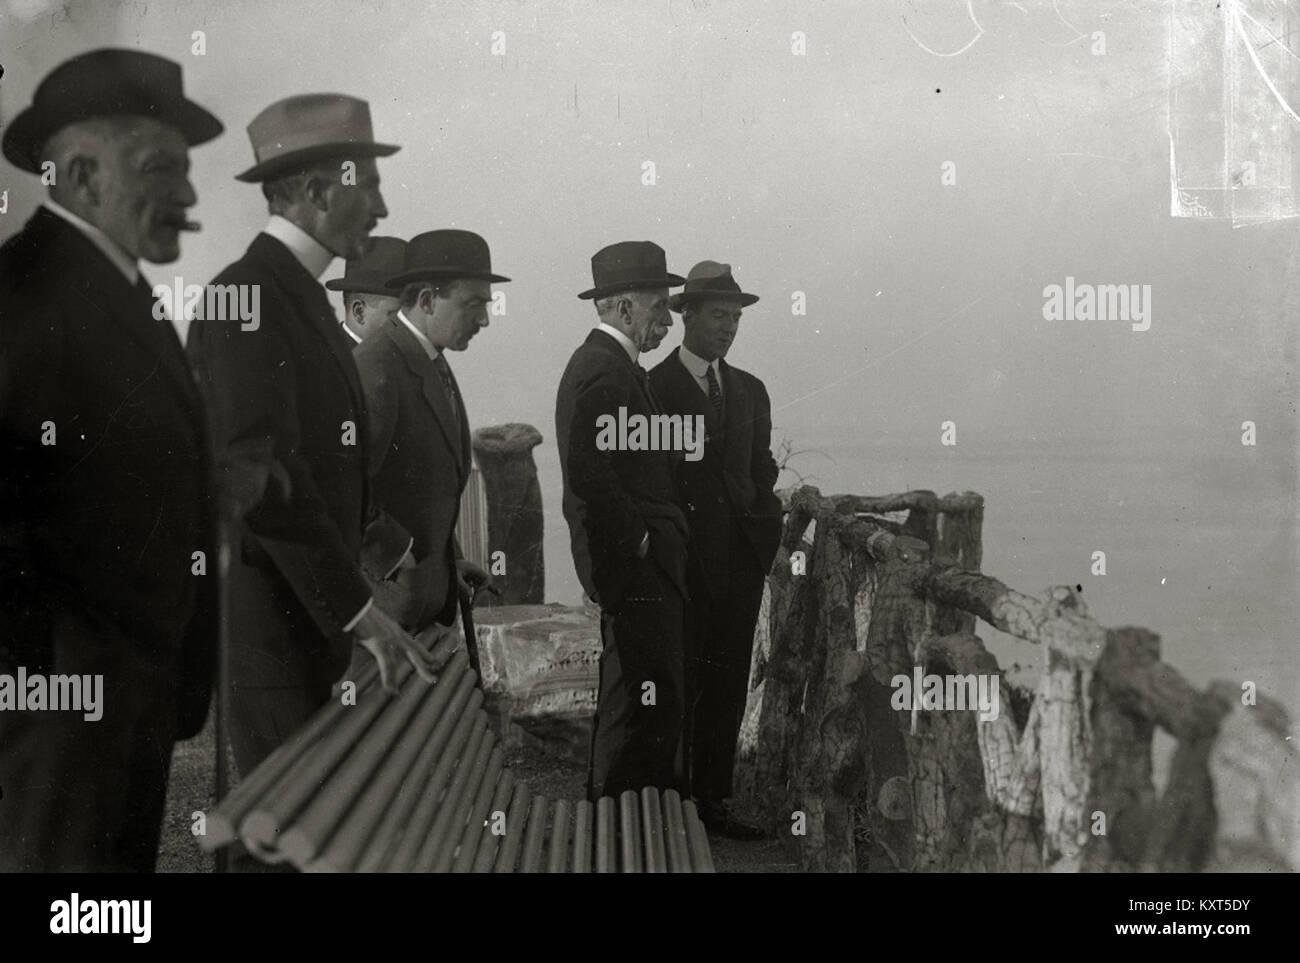 El alcalde de San Sebastián, Carlos de Uhagón, con un grupo de hombres (2 de 2) - Fondo Car-Kutxa Fototeka Stock Photo